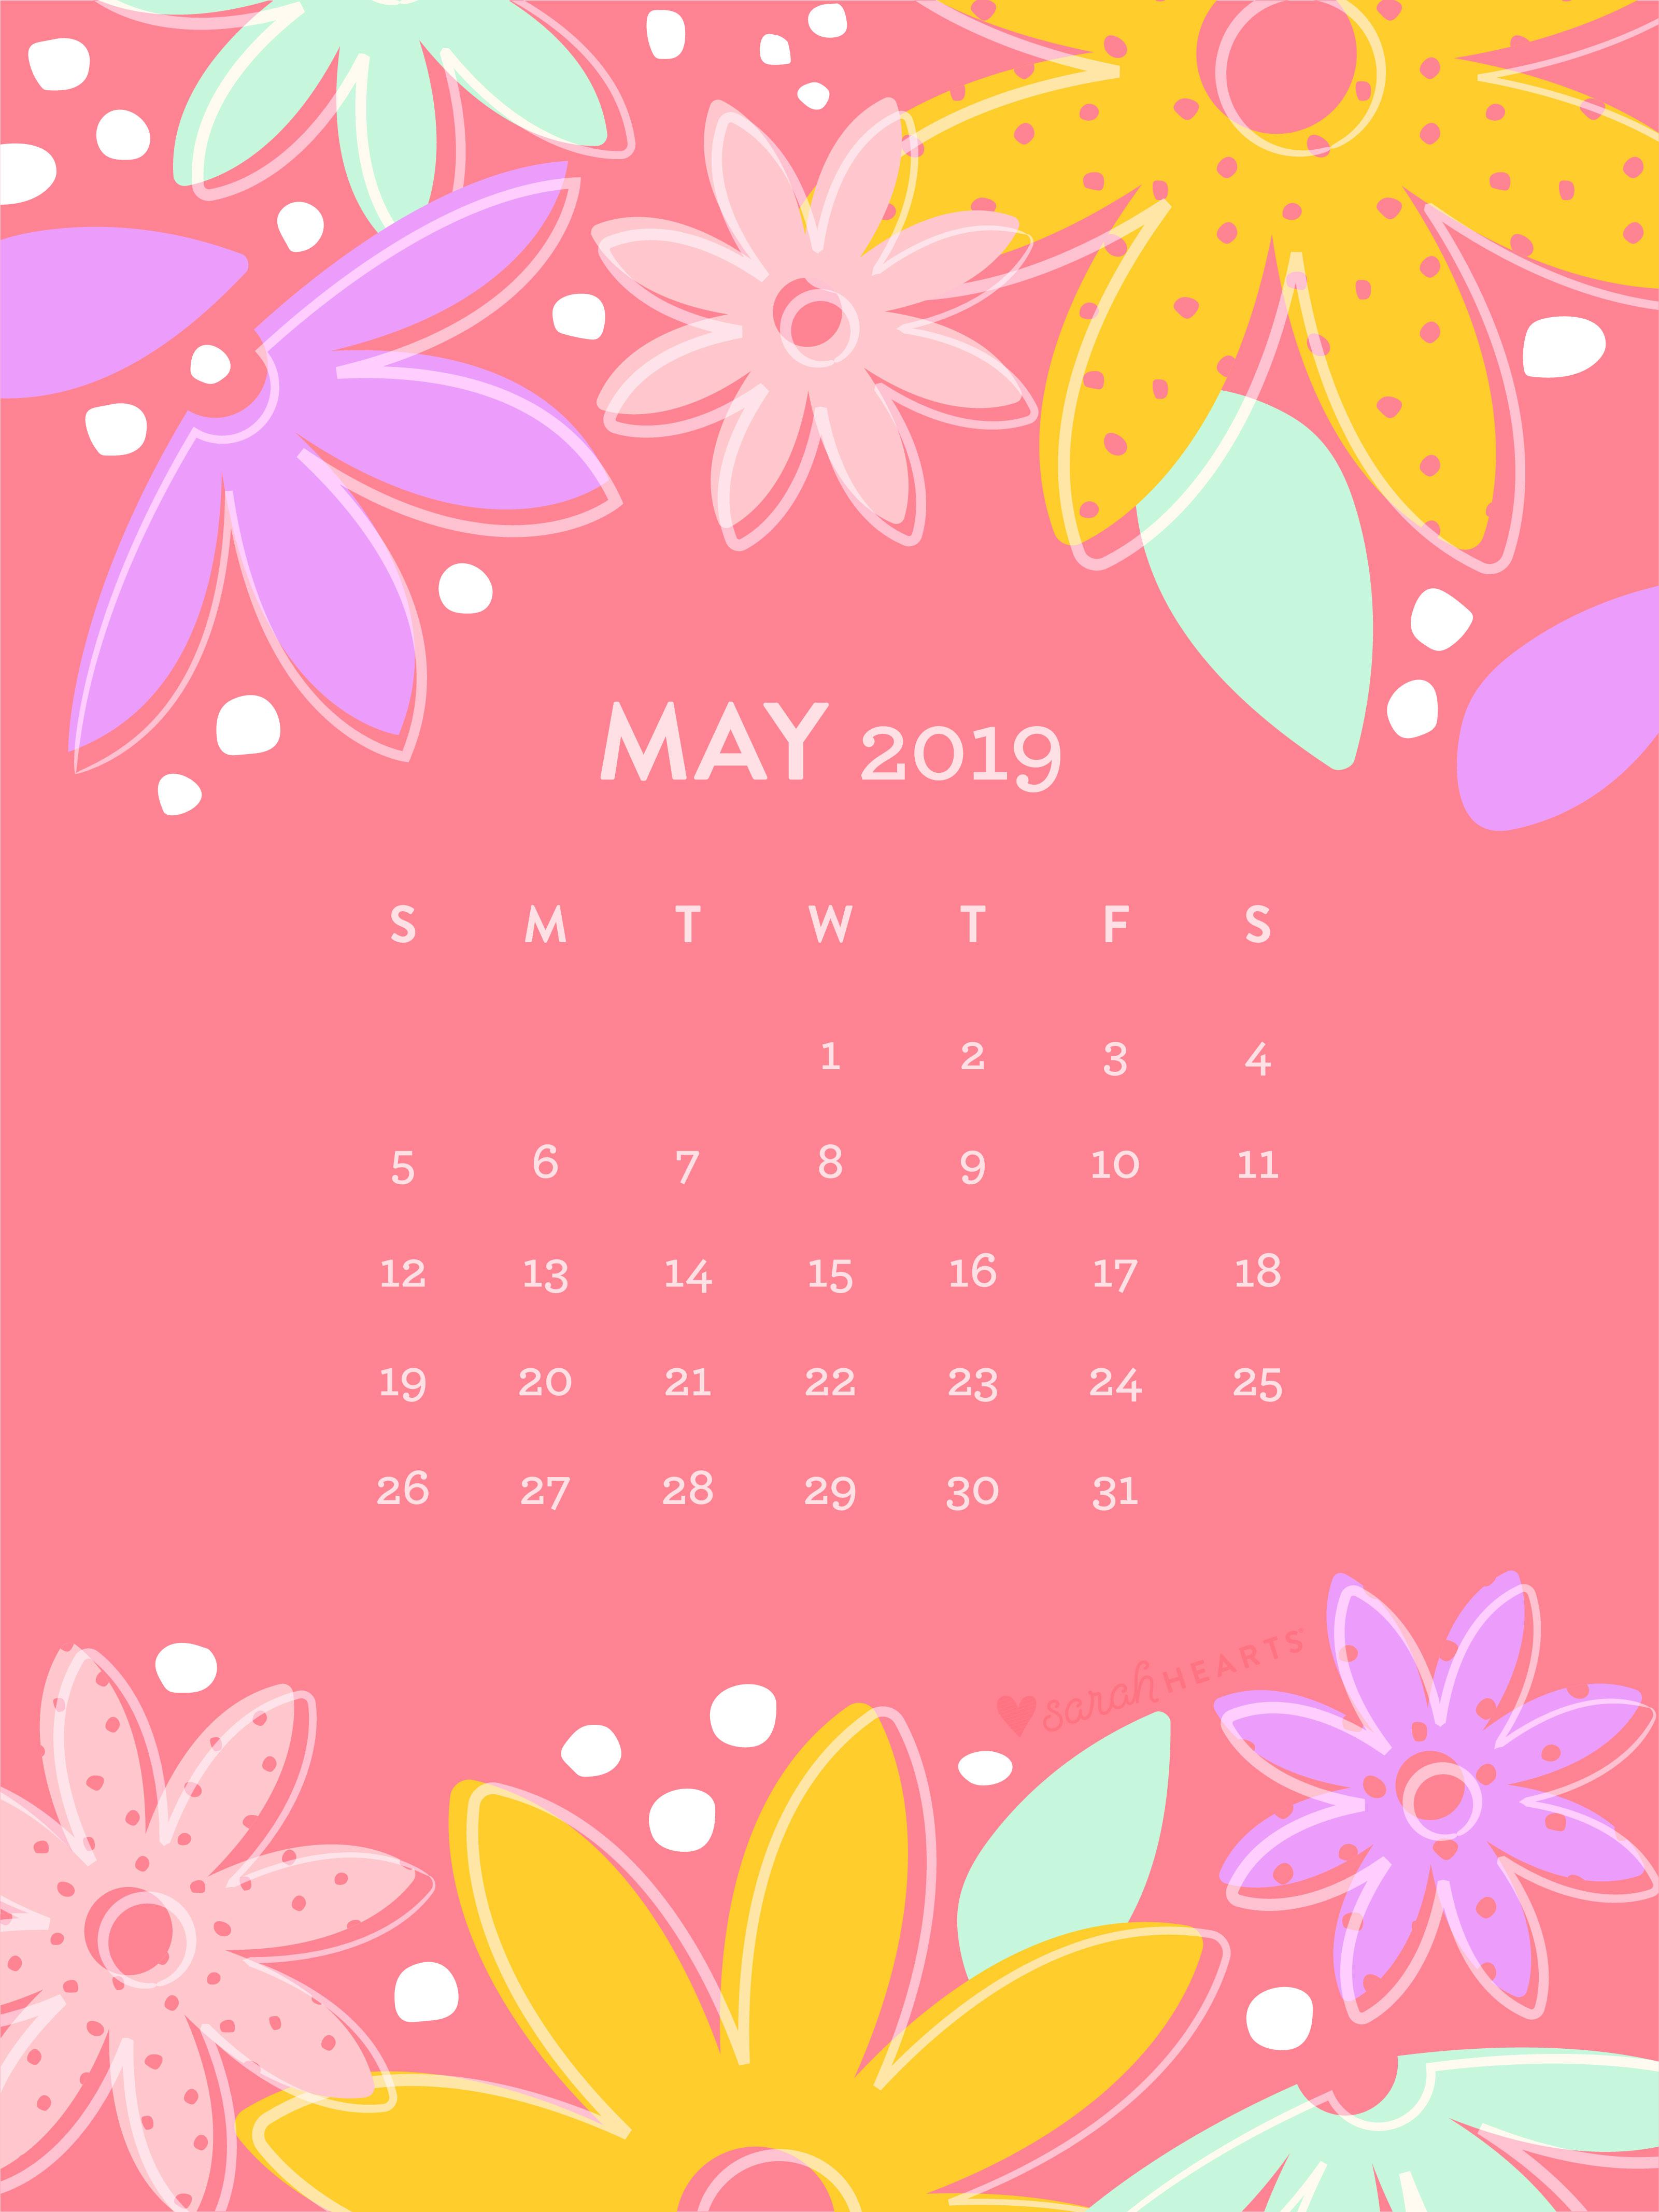 May 2019 Flower Calendar Wallpaper - Sarah Hearts